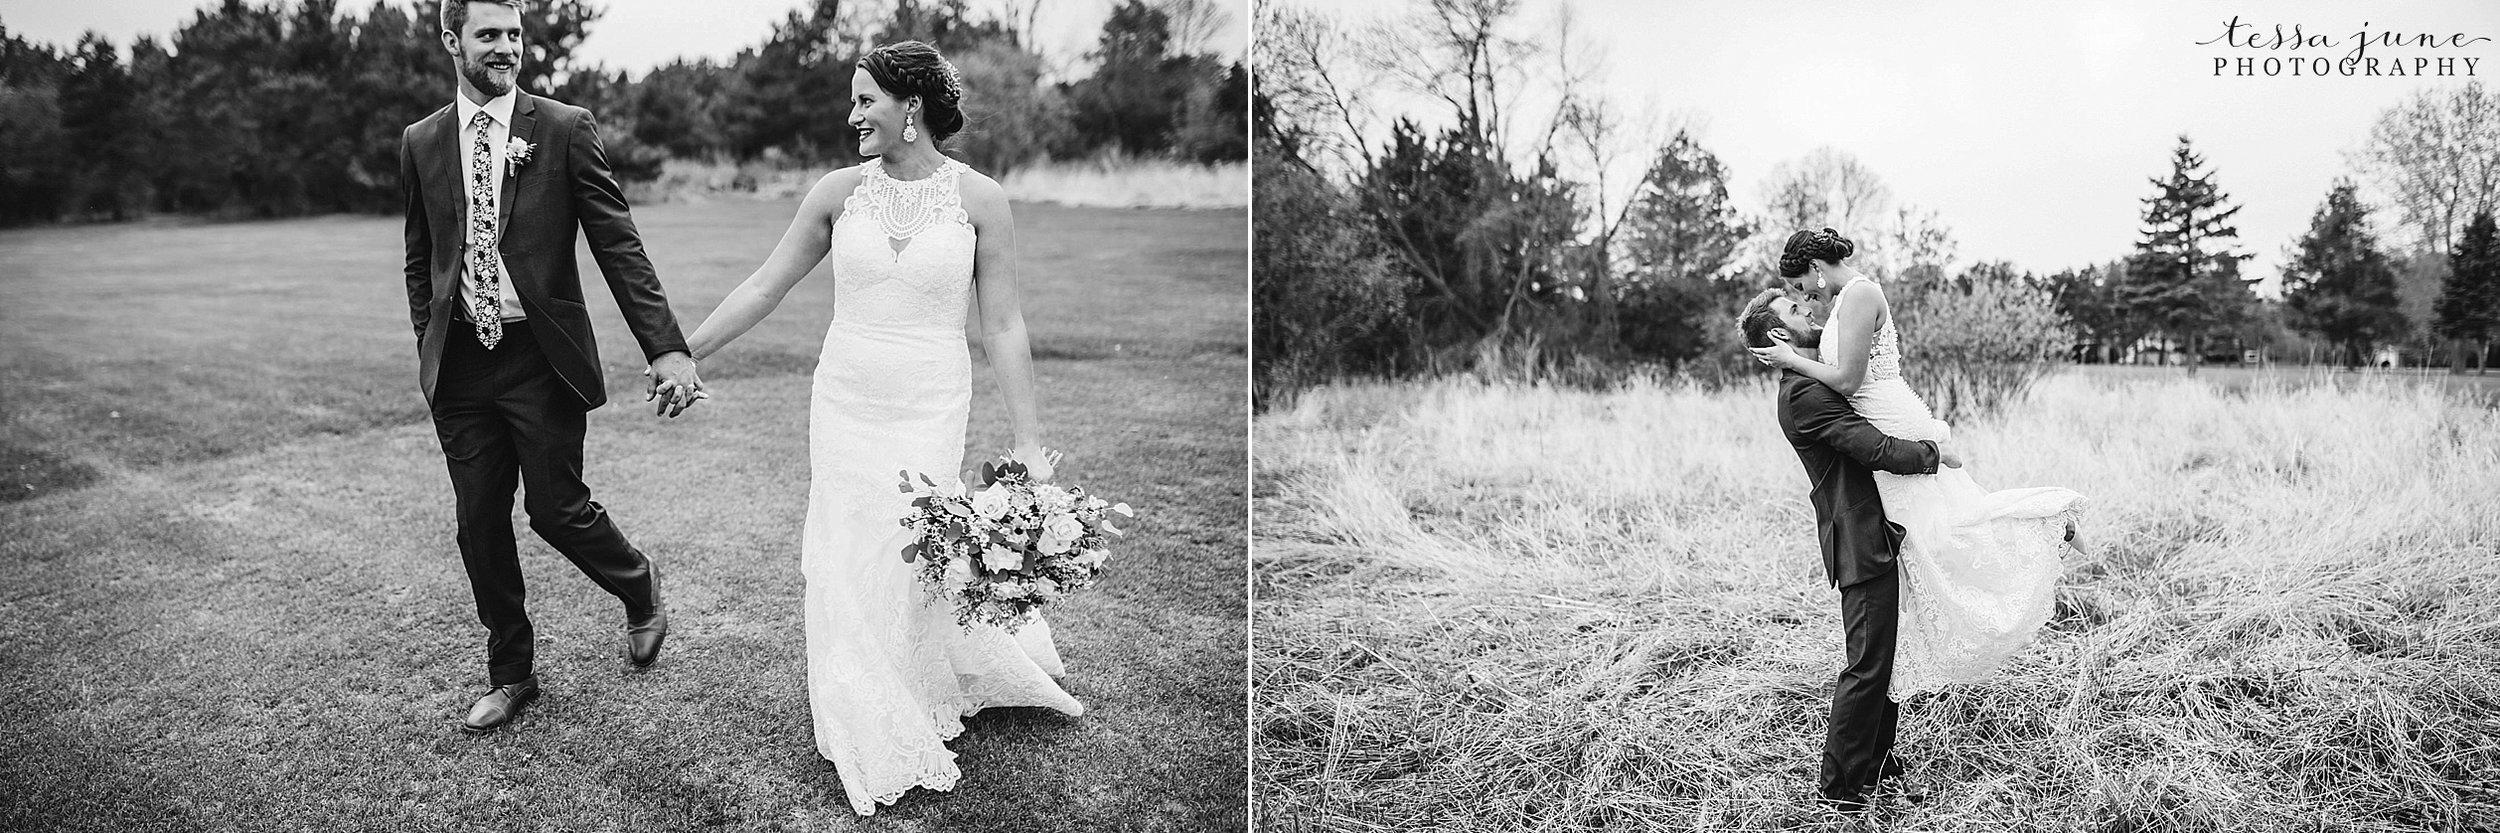 The-grands-at-mulligans-wedding-sartell-minnesota-spring-floral-spring-garden-wedding-134.jpg